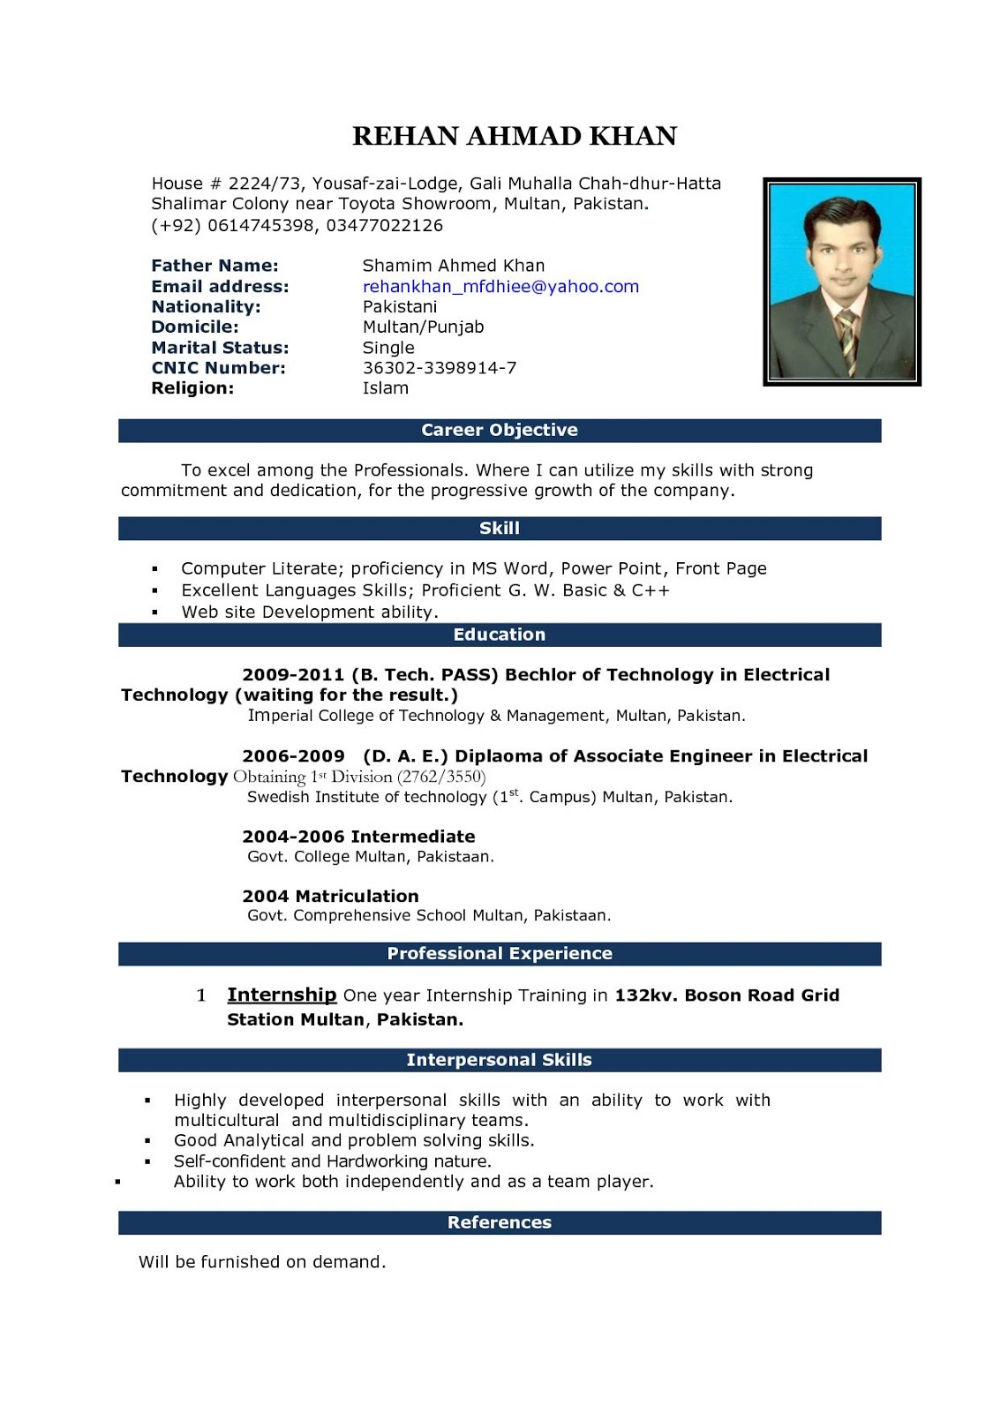 Free Resume Templates Free Resume Templates Word Free Resume Templates 2020 Free In 2020 Resume Template Word Free Resume Template Download Microsoft Resume Templates